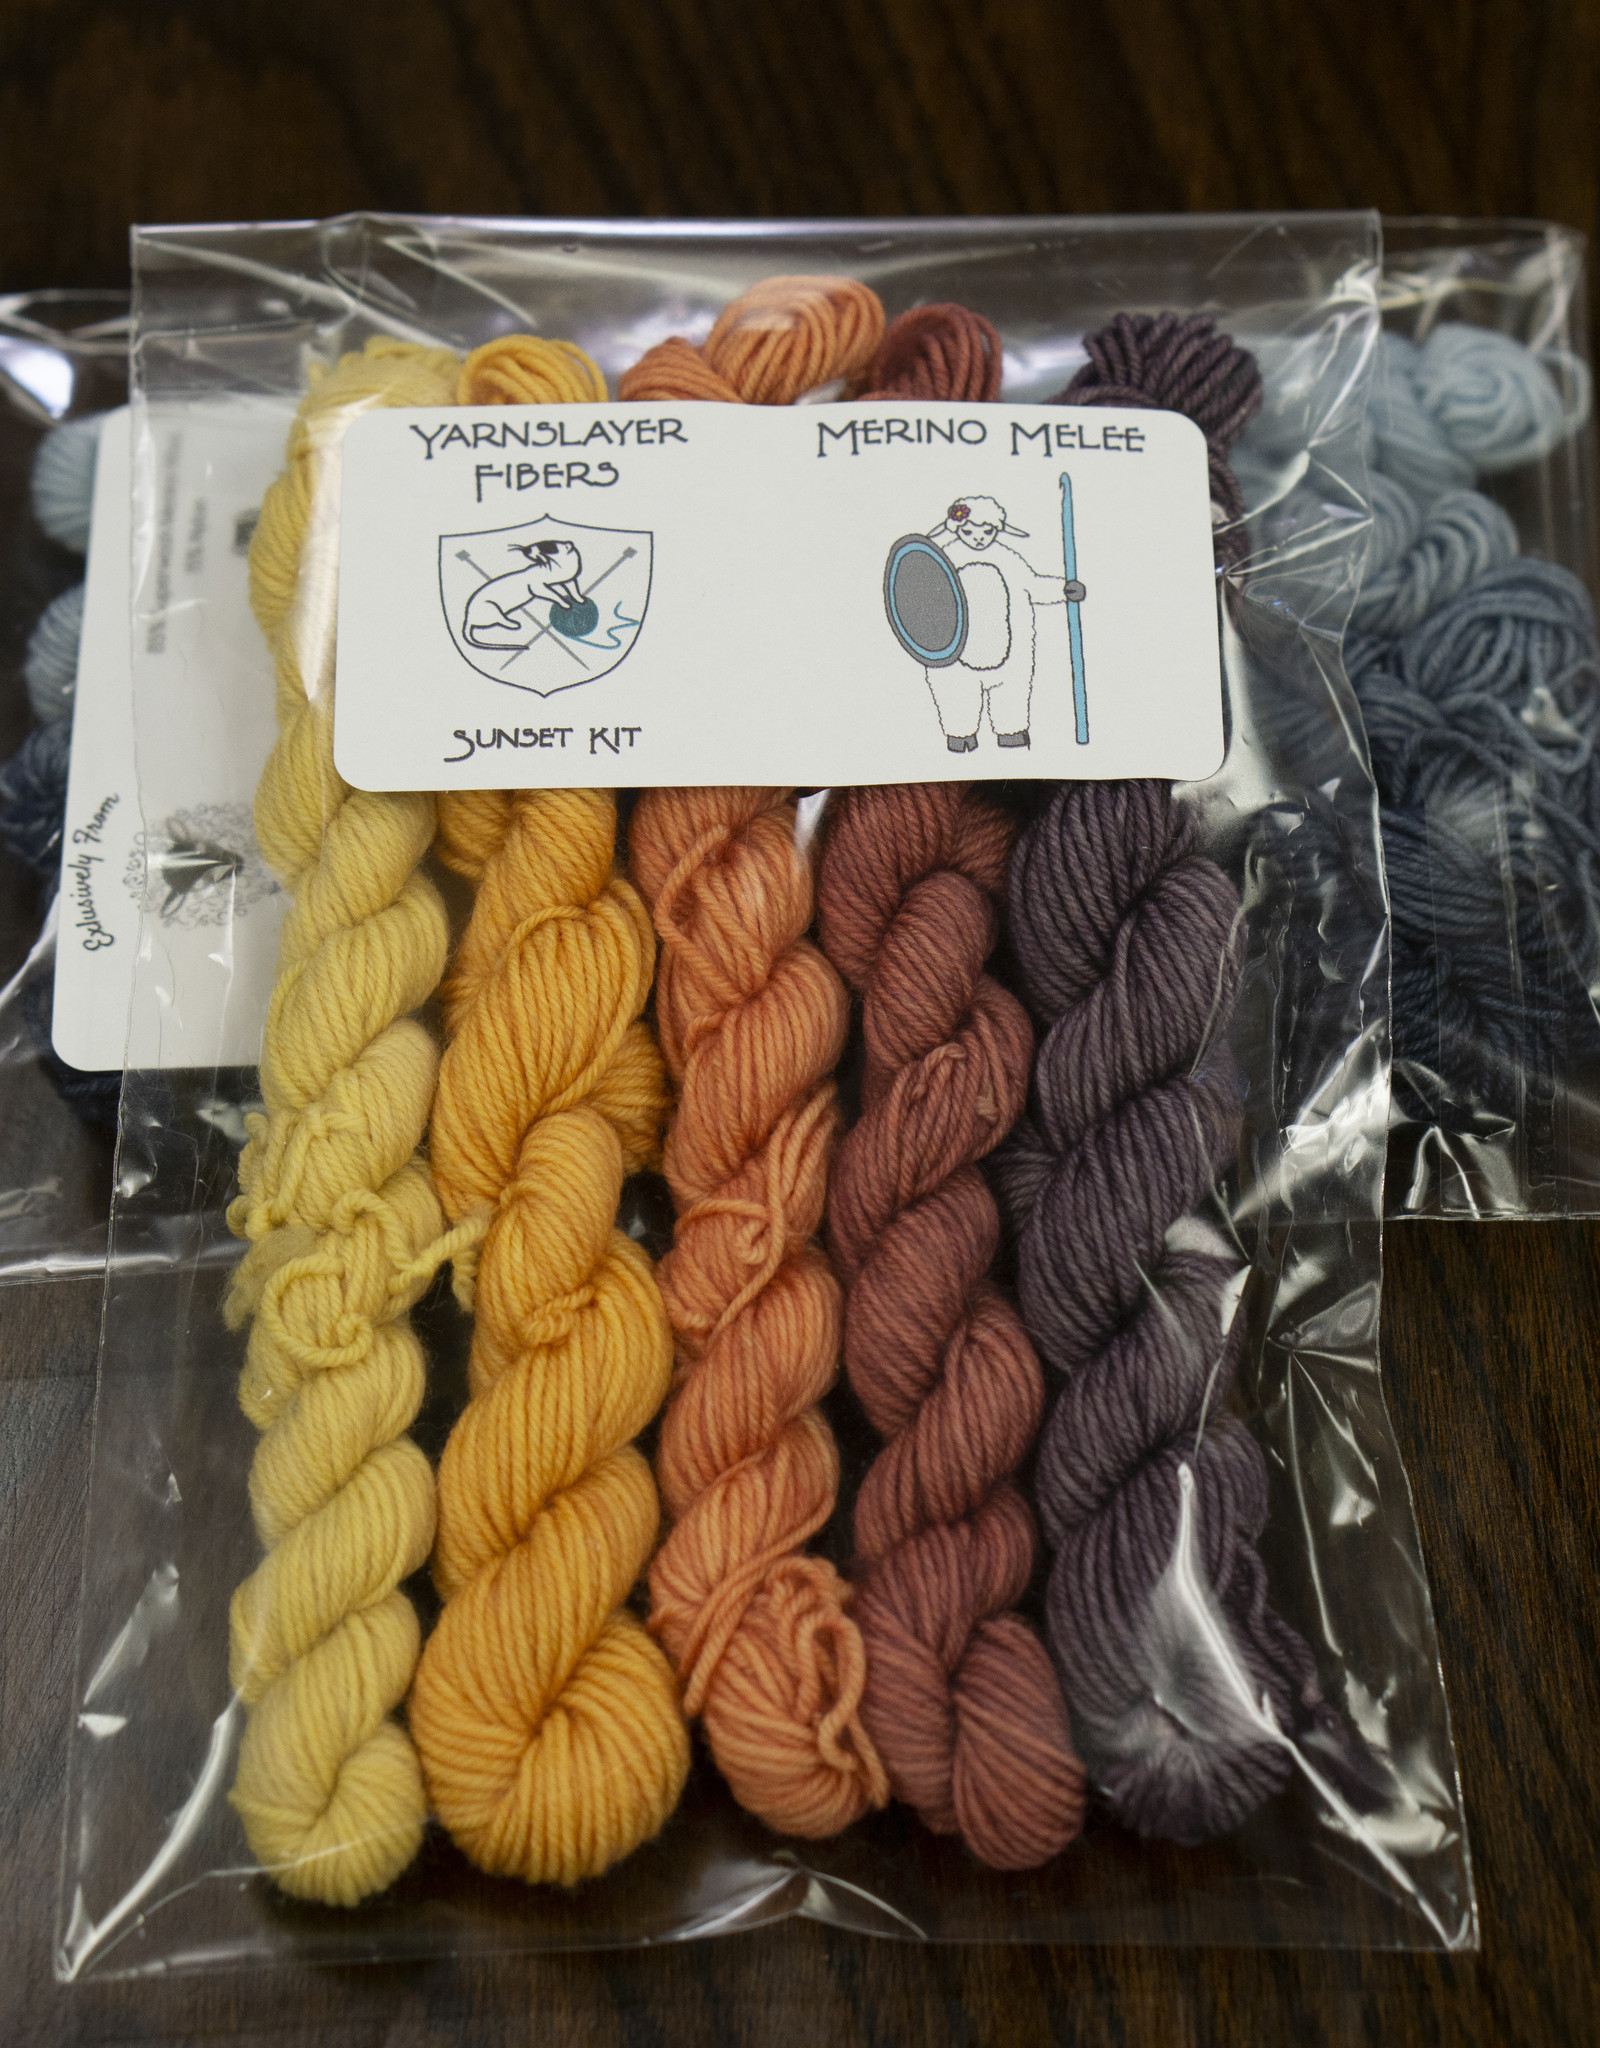 Yarnslayer Fibers Yarnslayer 10g Kits